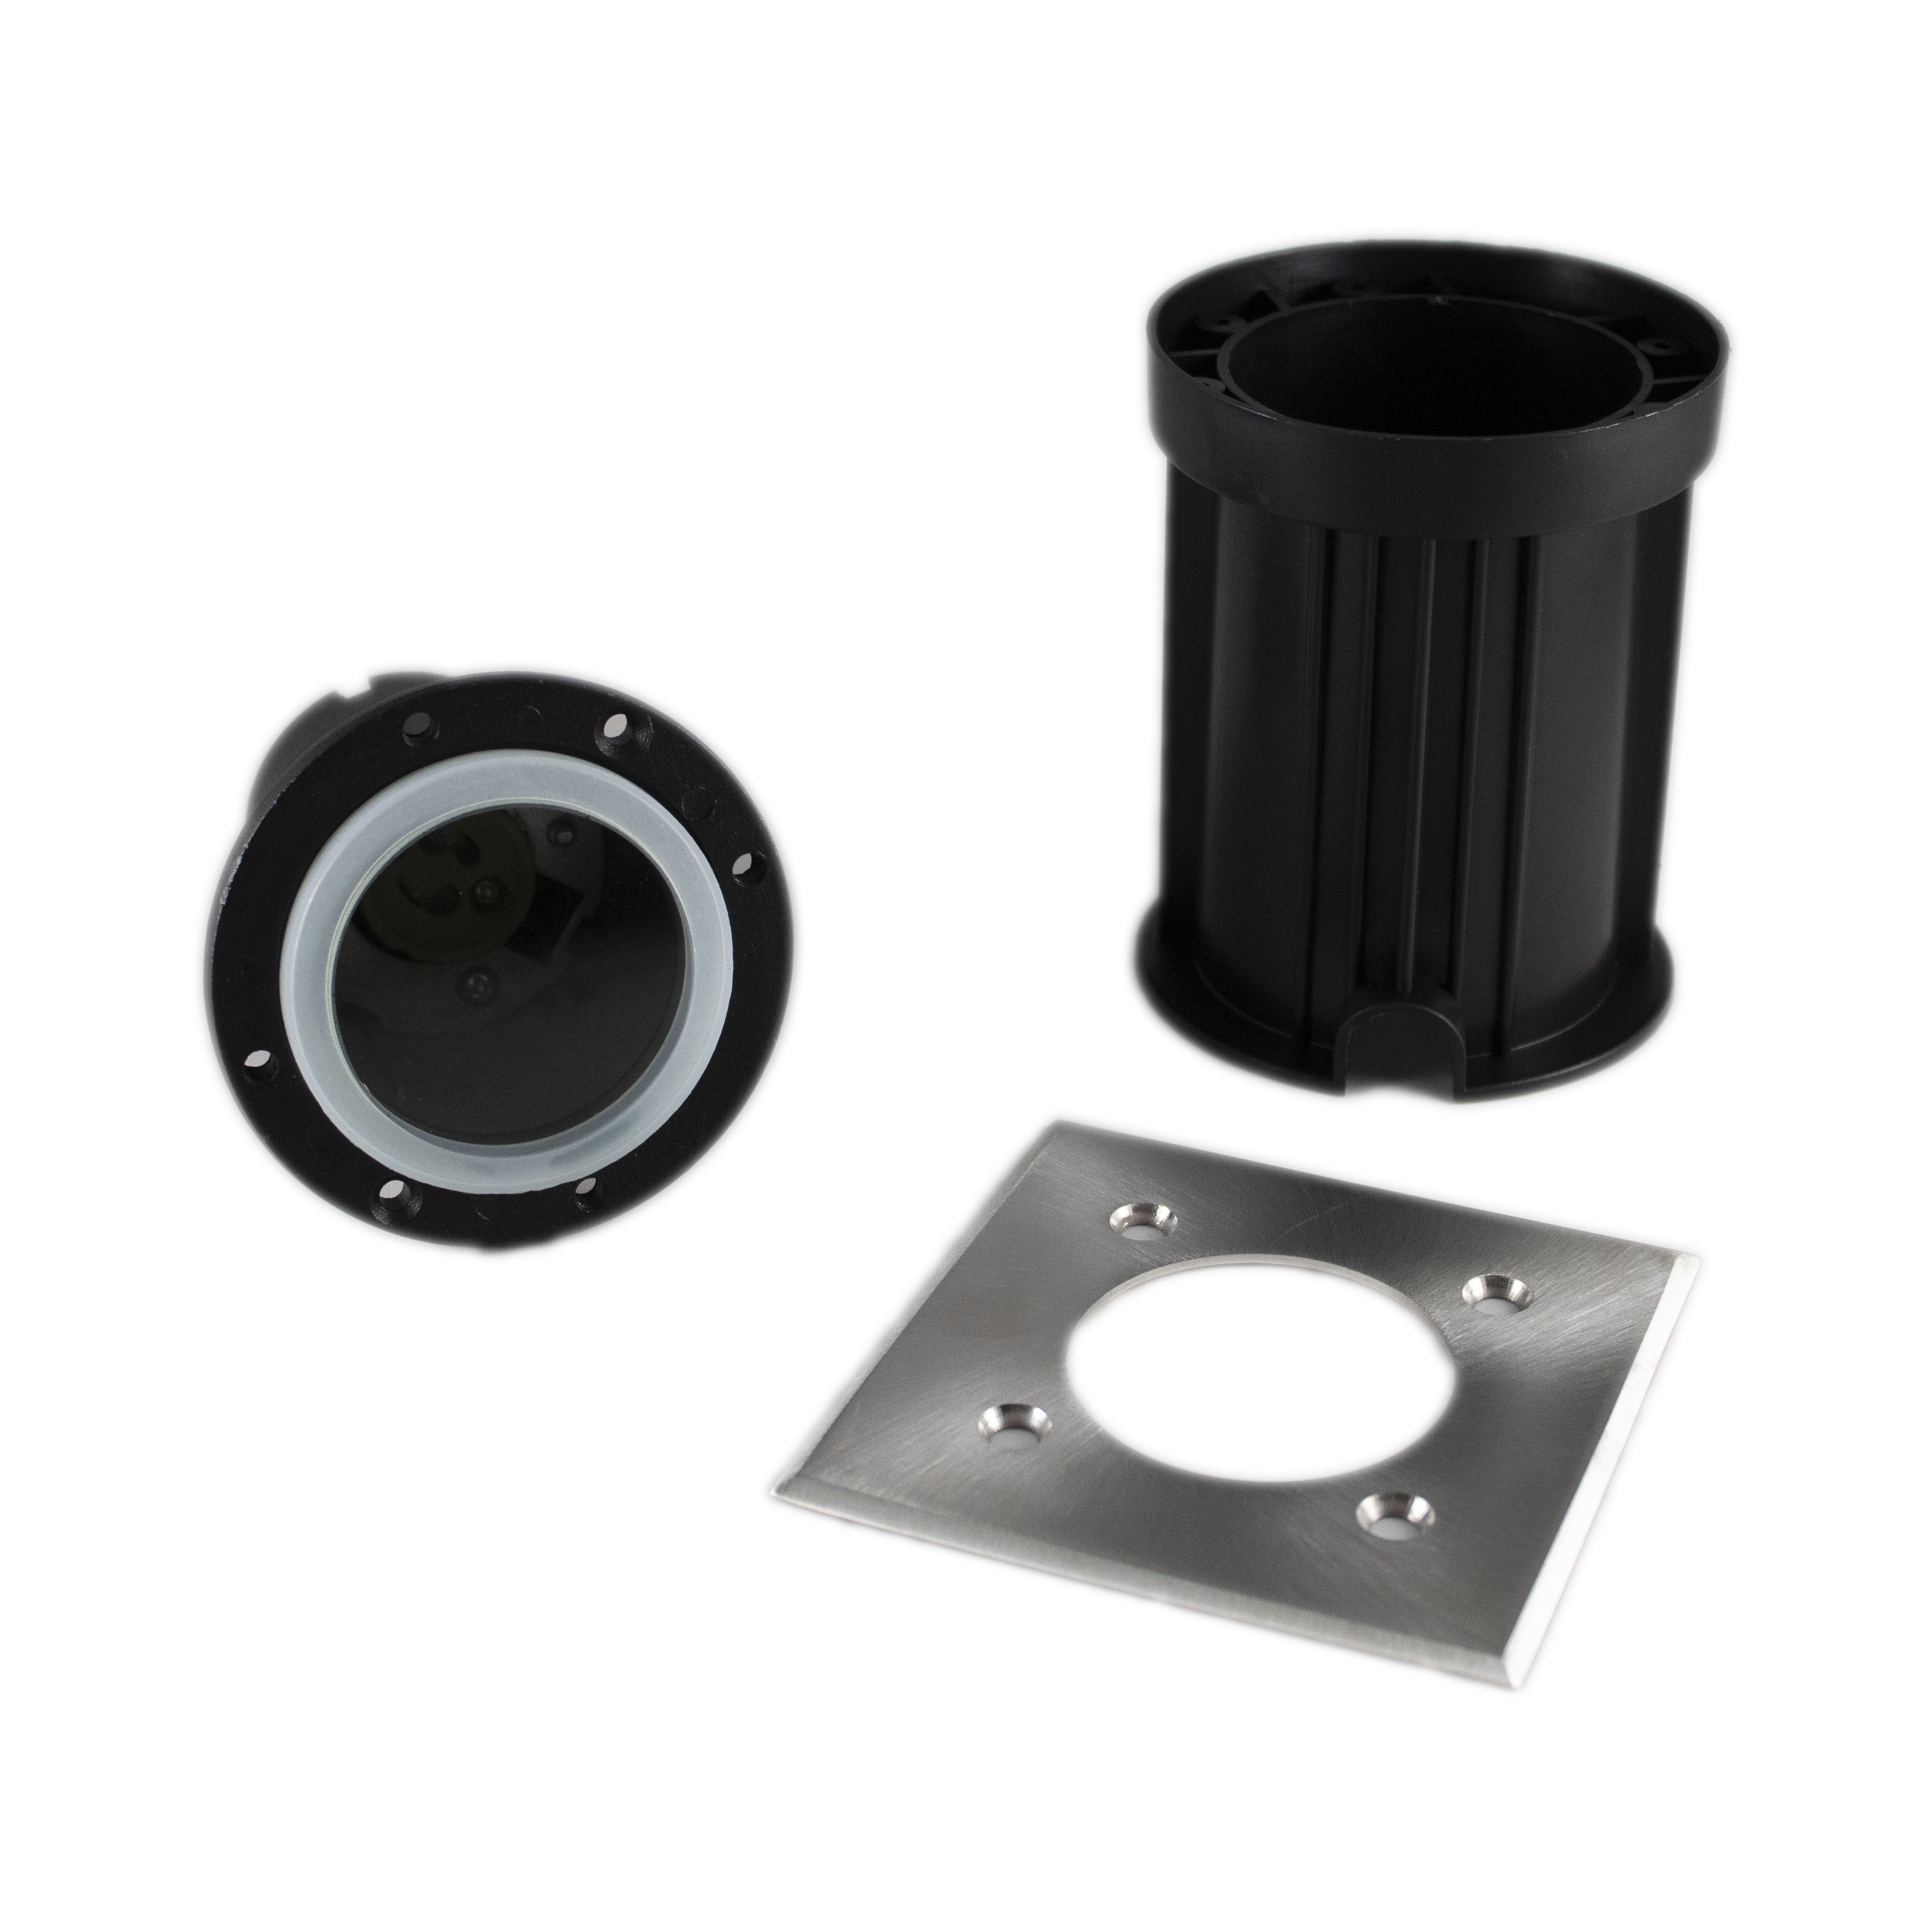 Led grondspot vierkant IP67 1 keer GU10 fitting - onderdelen waterdichte grondspot